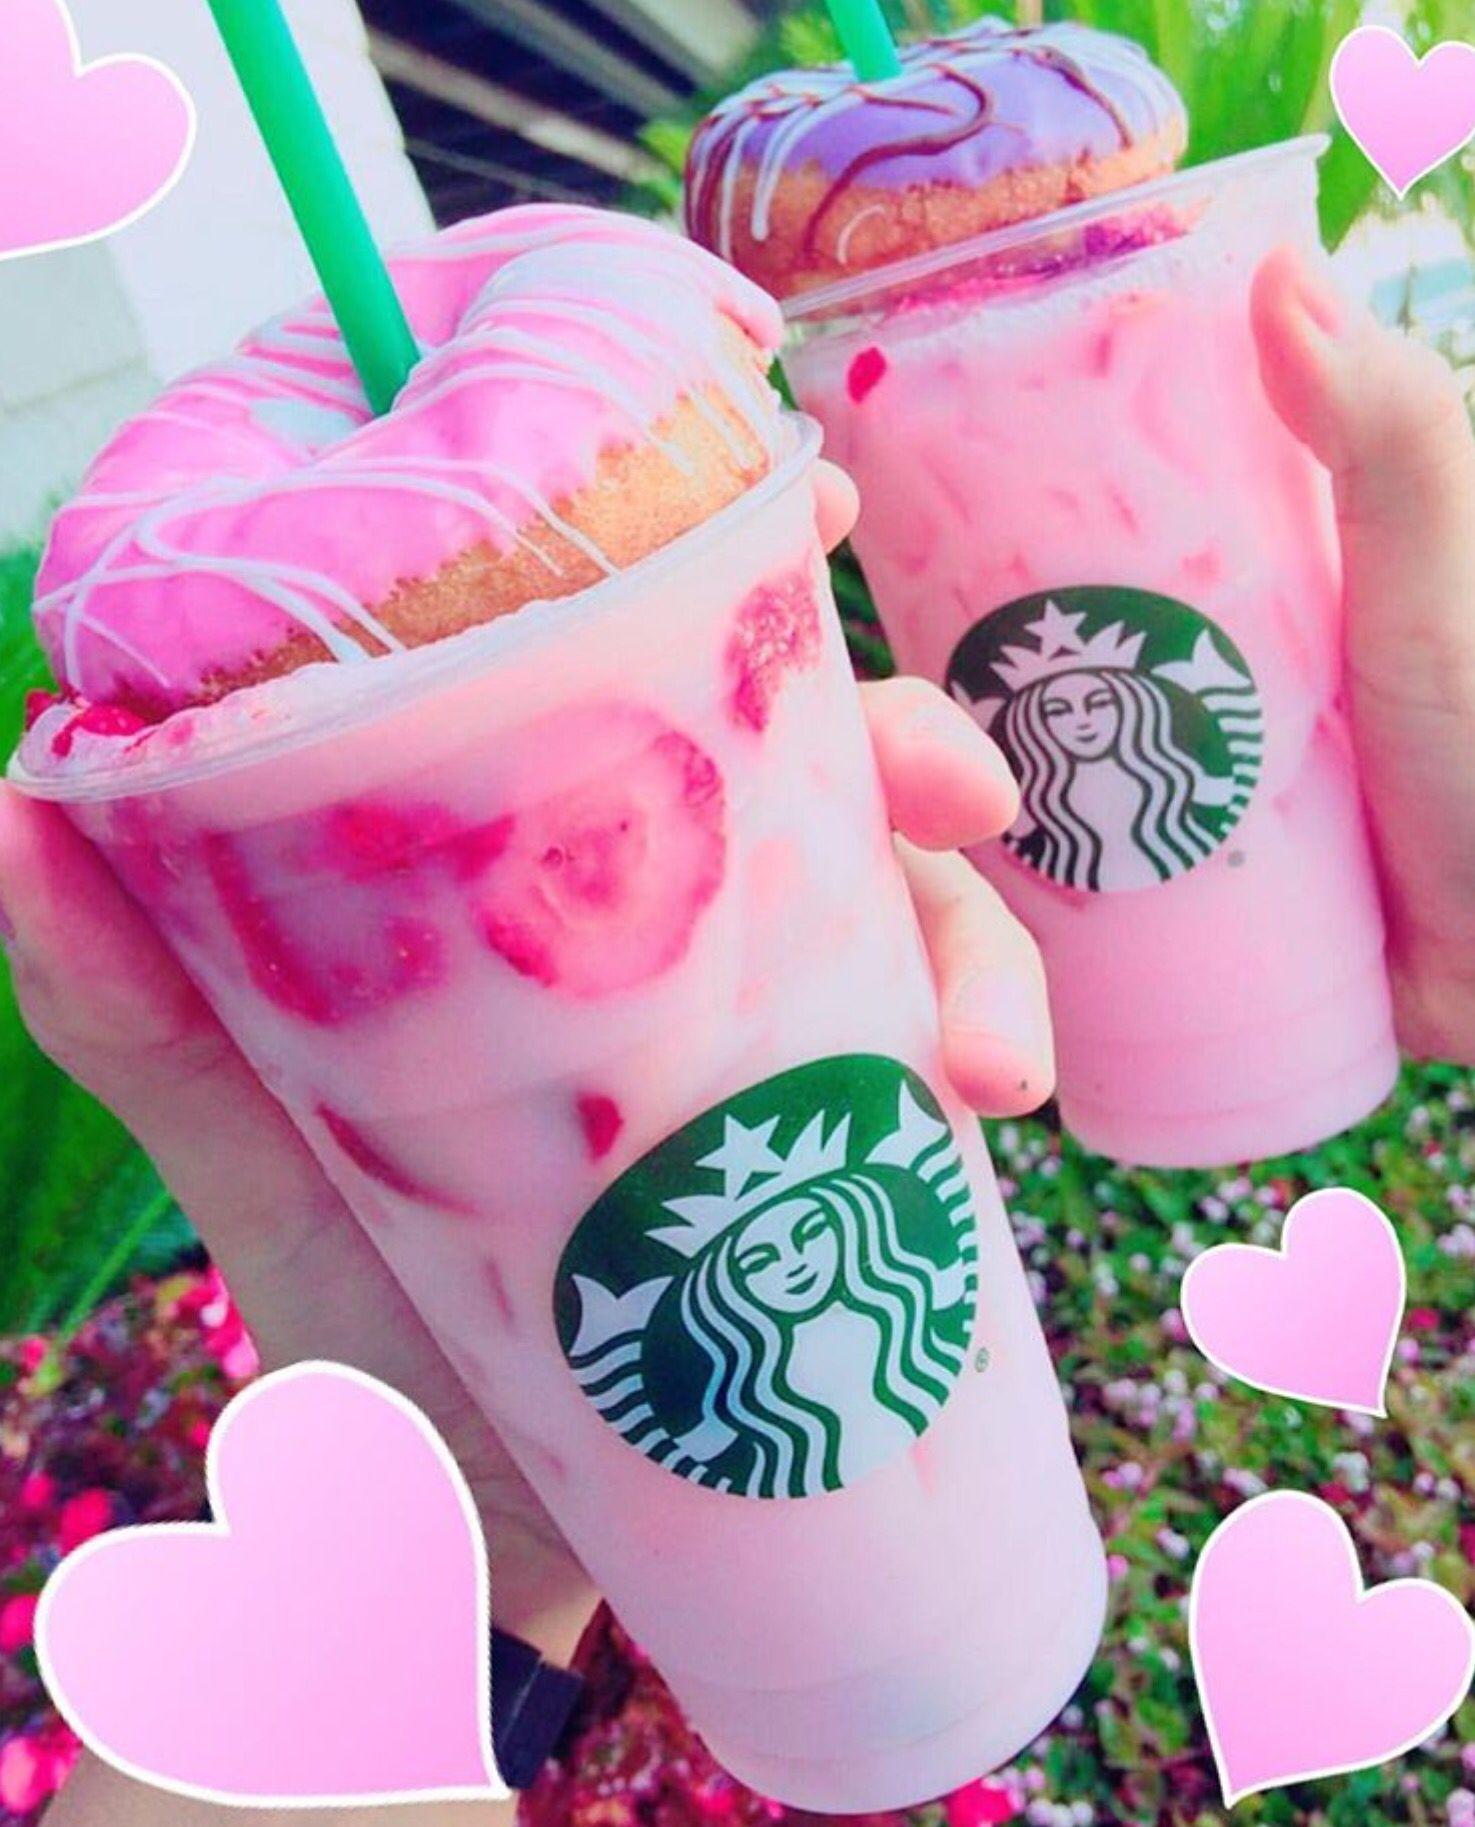 starbucks pink drink drinks strawberry donut menu secret frappuccino coffee unicorn donuts food kawaii recipes rainbow purple backgrounds dunkin yummy